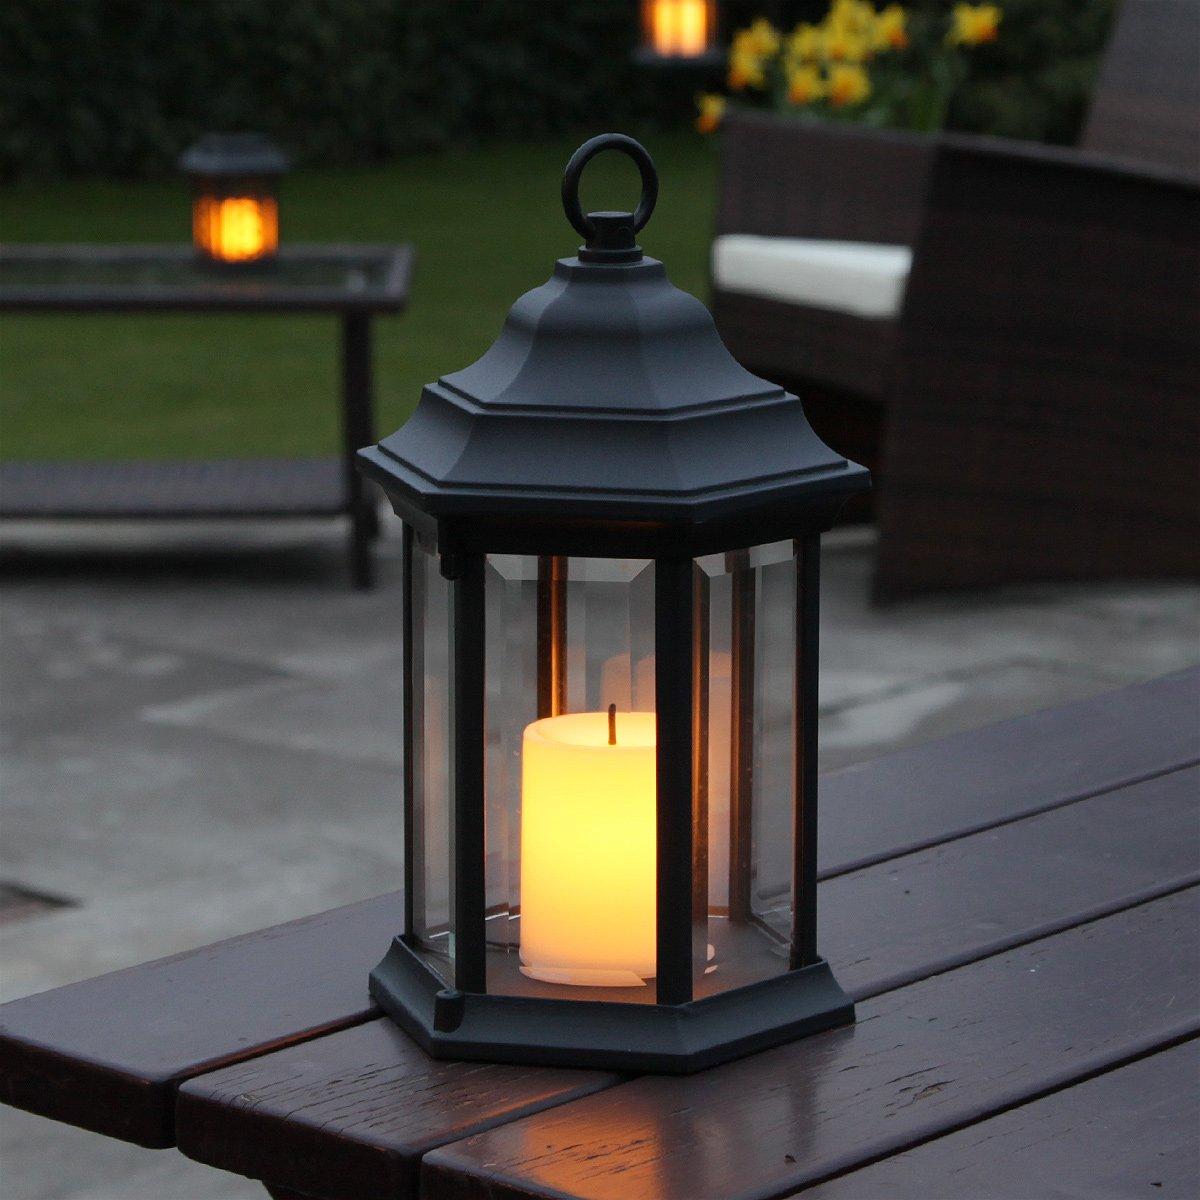 Outdoor Aluminium Lantern   Flickering Amber Candle   LED   Timer   27.8cm    Battery Operated By Festive Lights: Amazon.co.uk: Kitchen U0026 Home